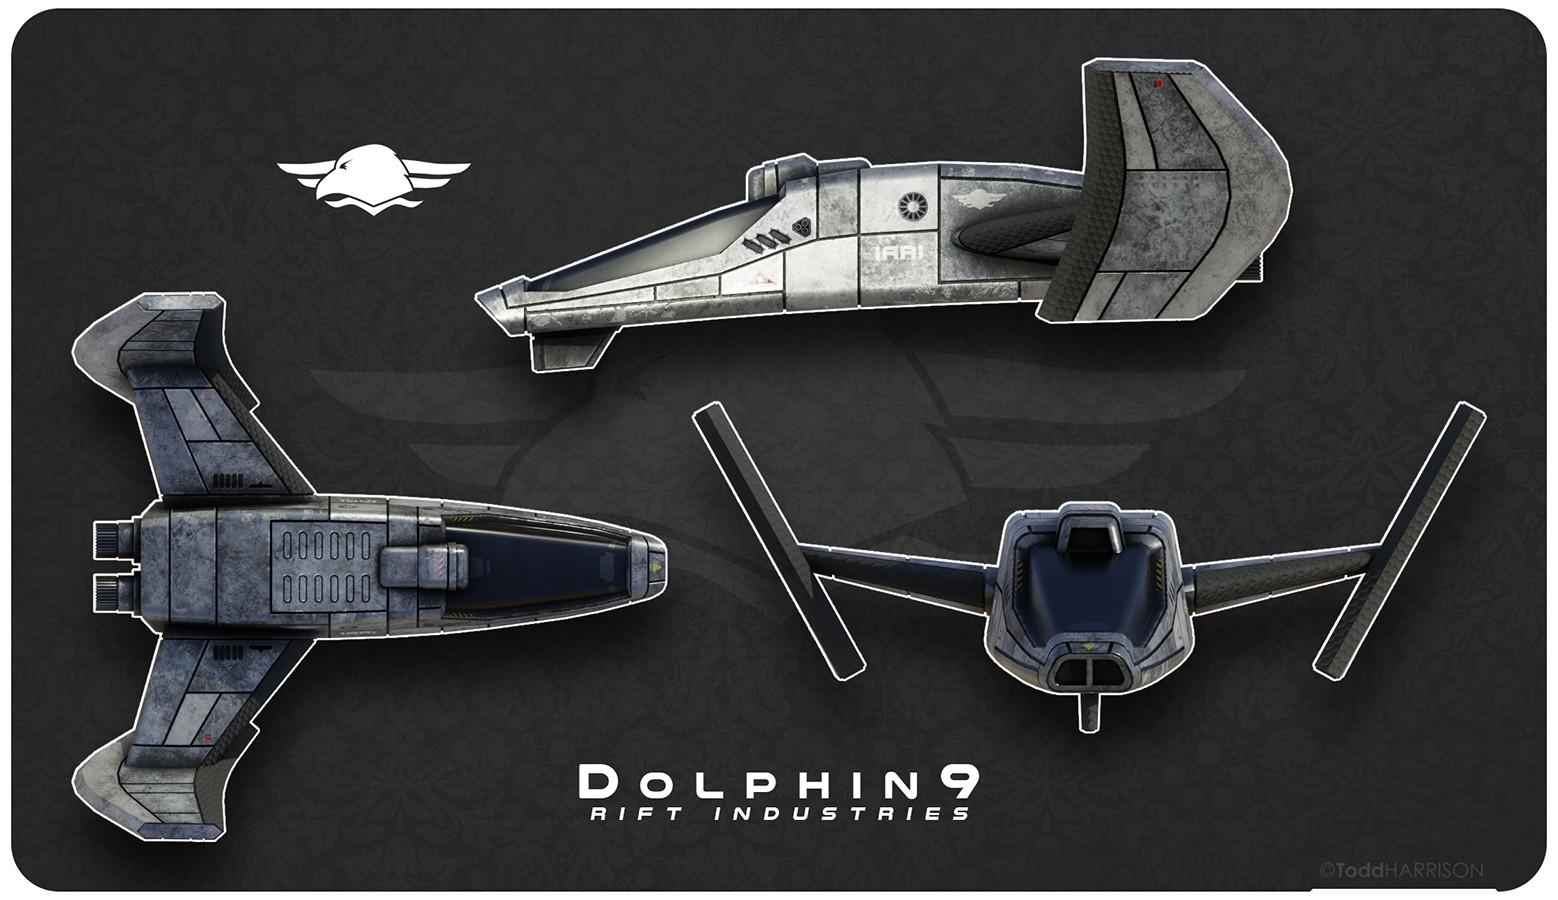 Todd harrison ri dolphin9 3v web